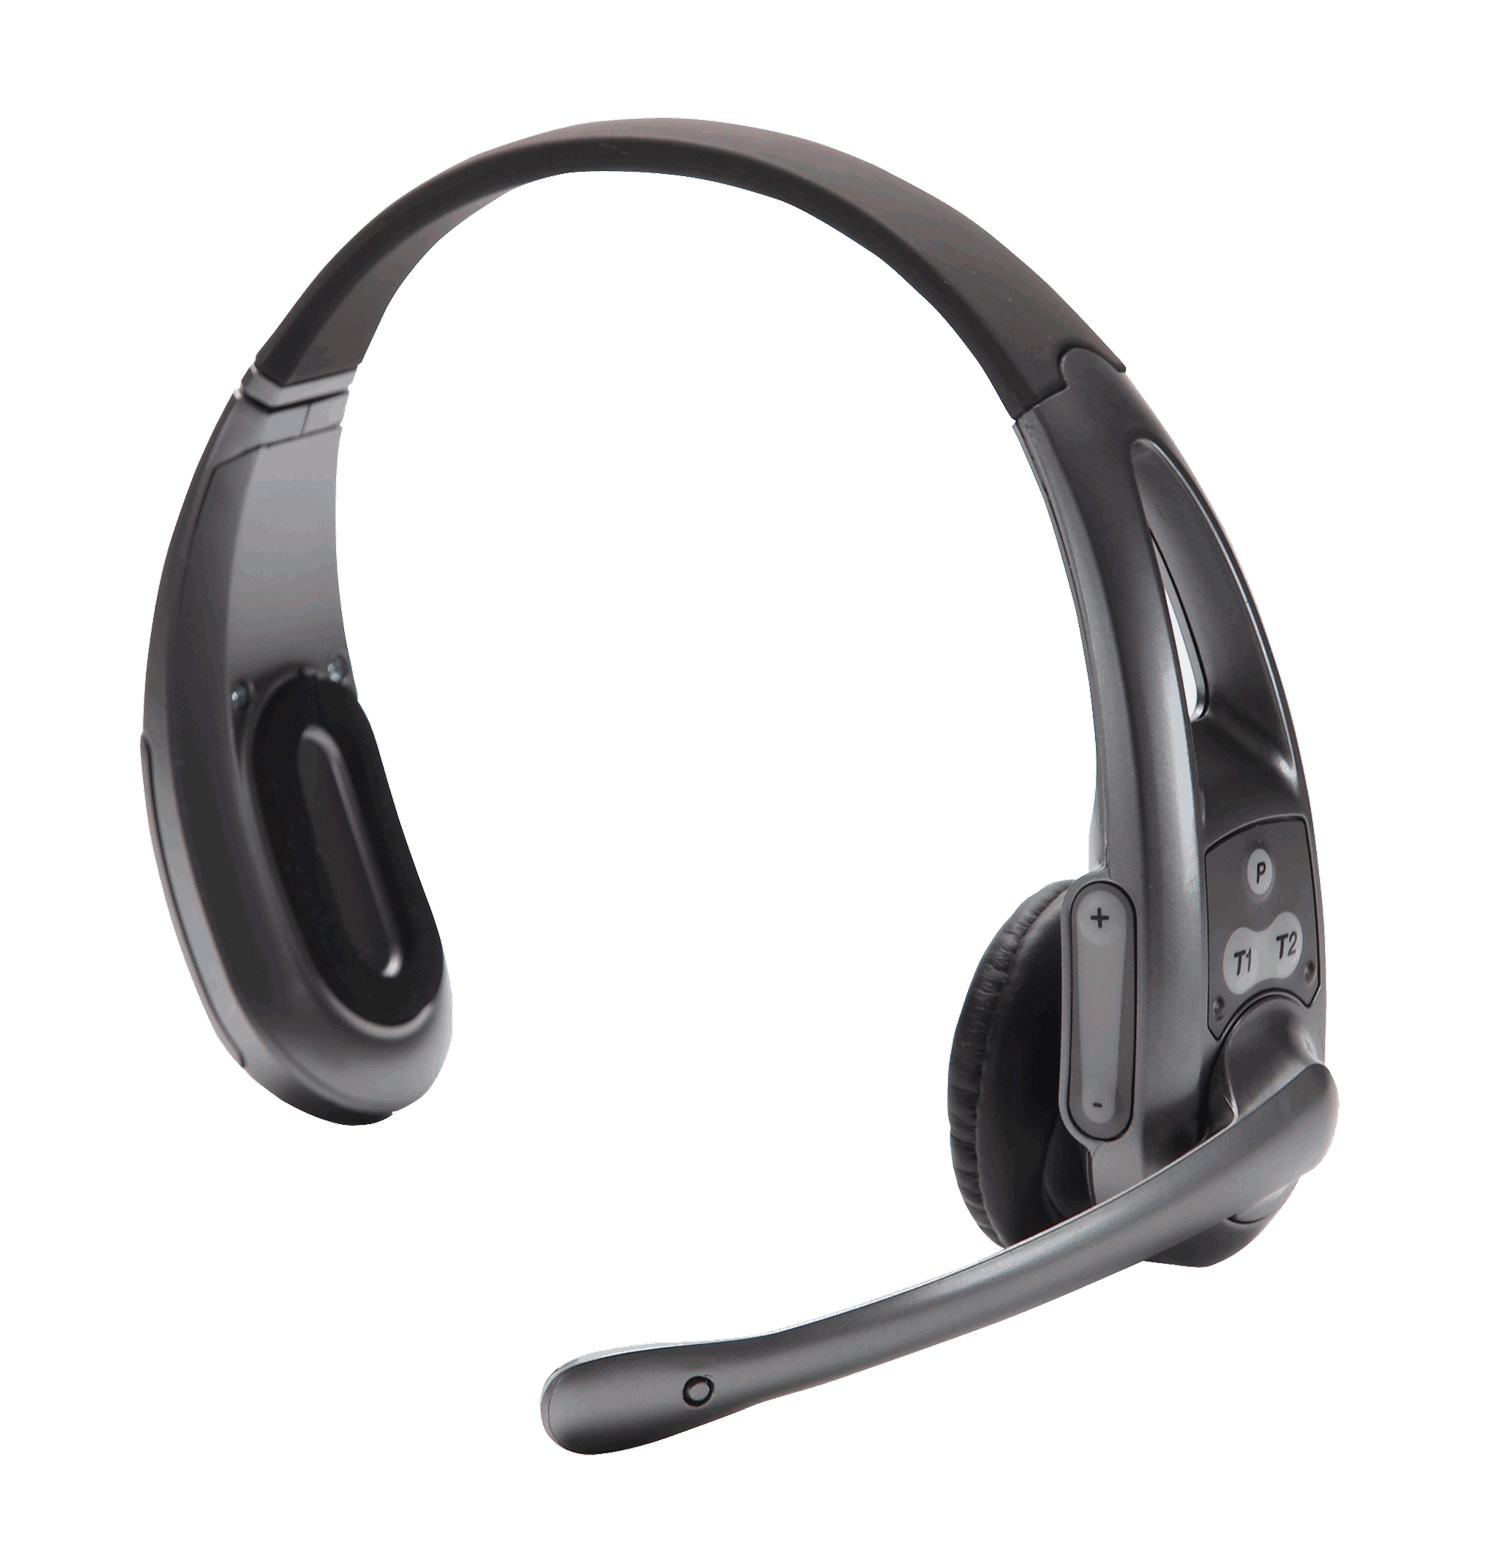 Q-Pro5 Headset